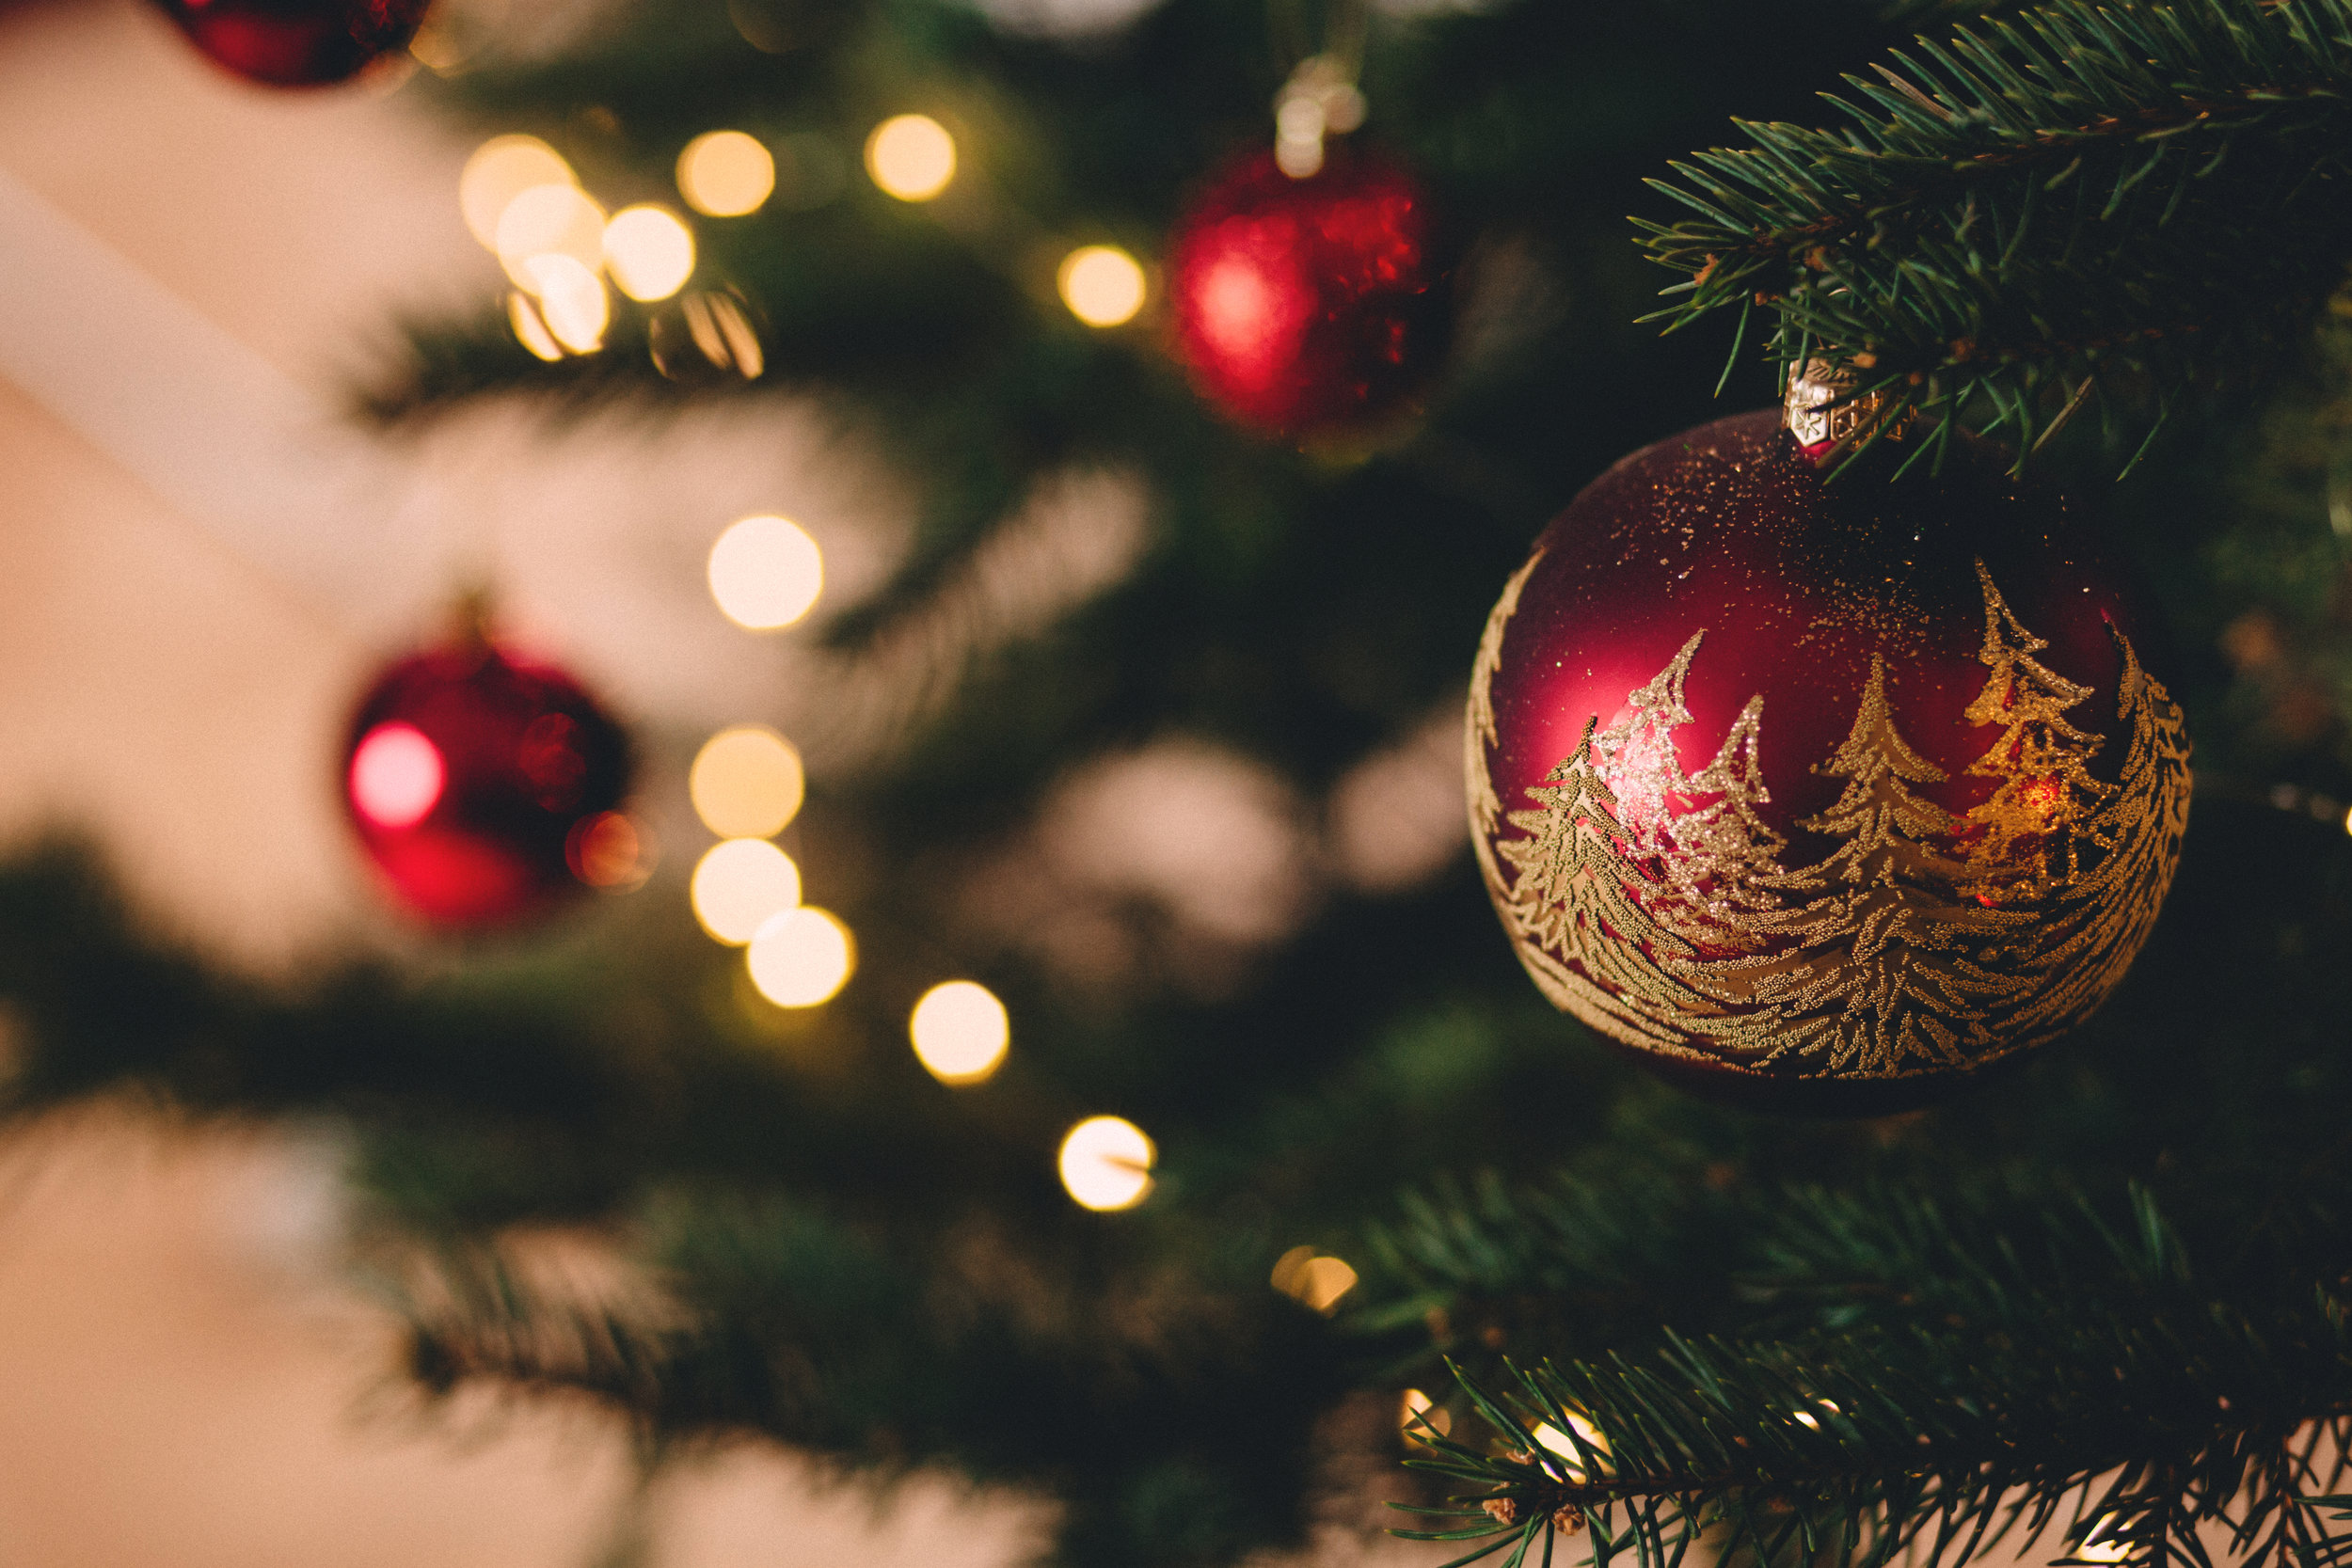 Julebord//Christmas Party - 16. novemberEpisk/Epic